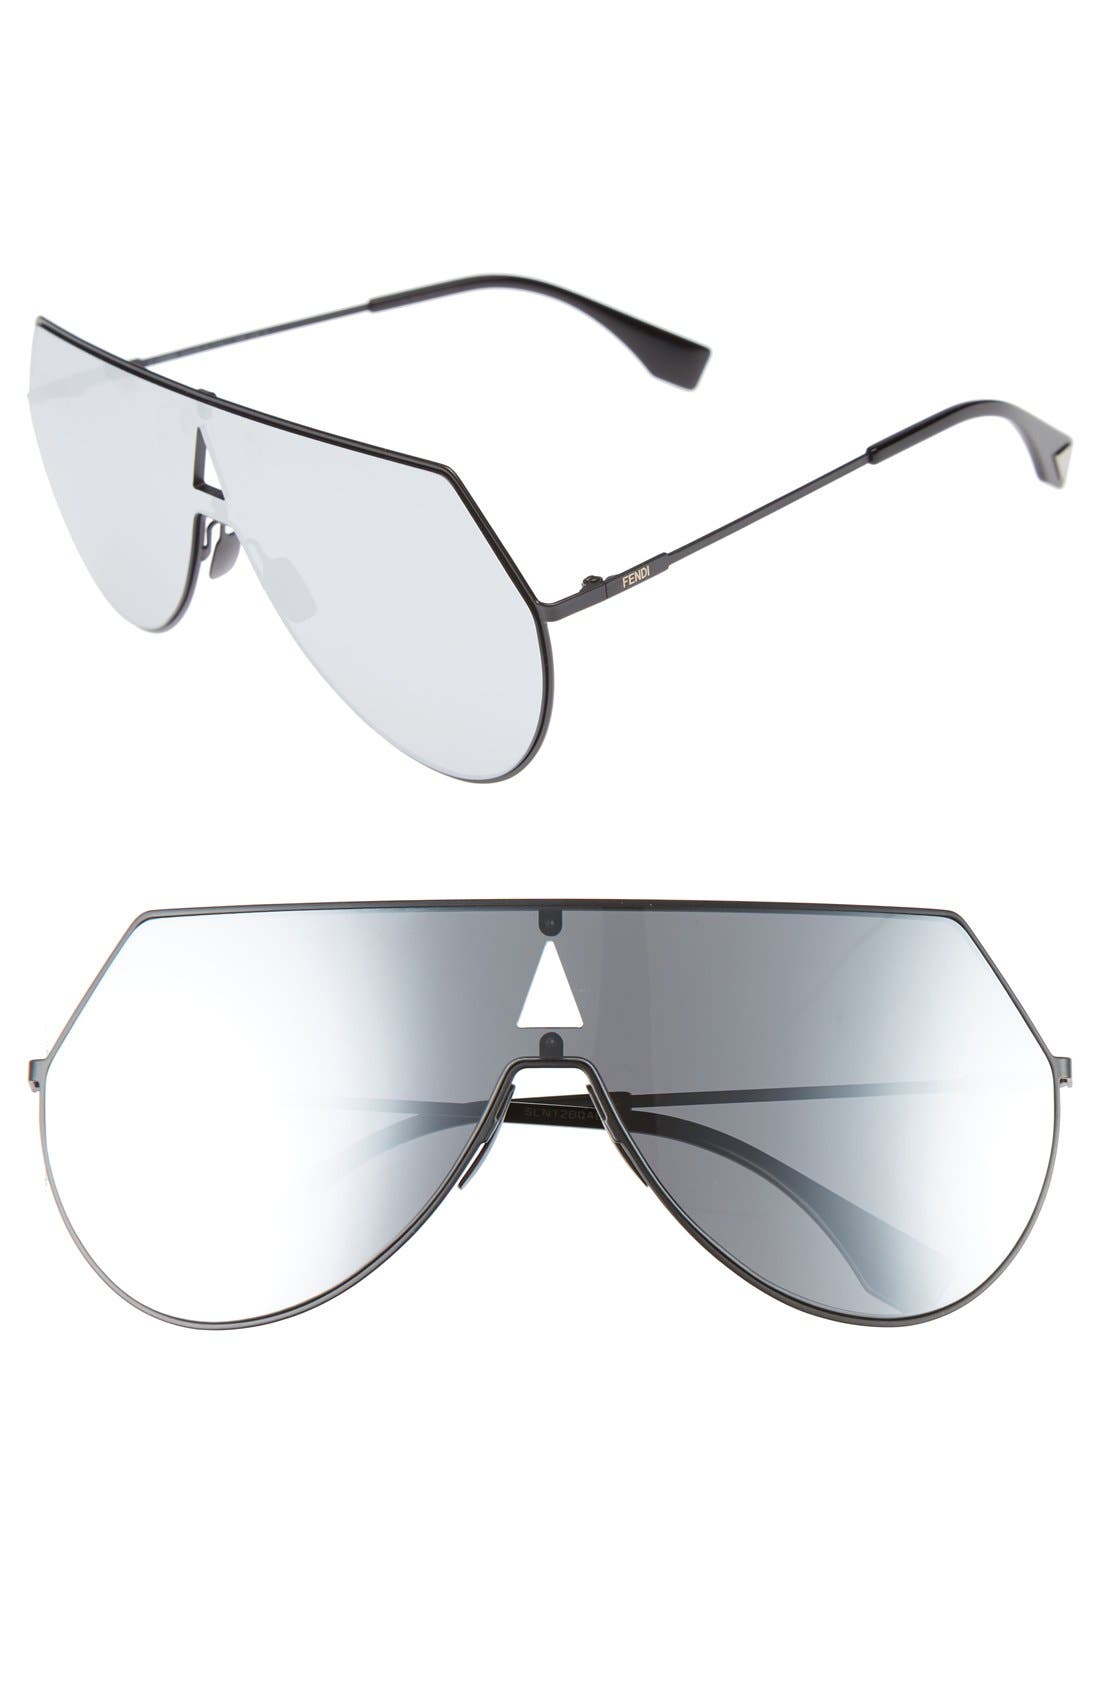 Alternate Image 1 Selected - Fendi 99mm Eyeline Aviator Sunglasses